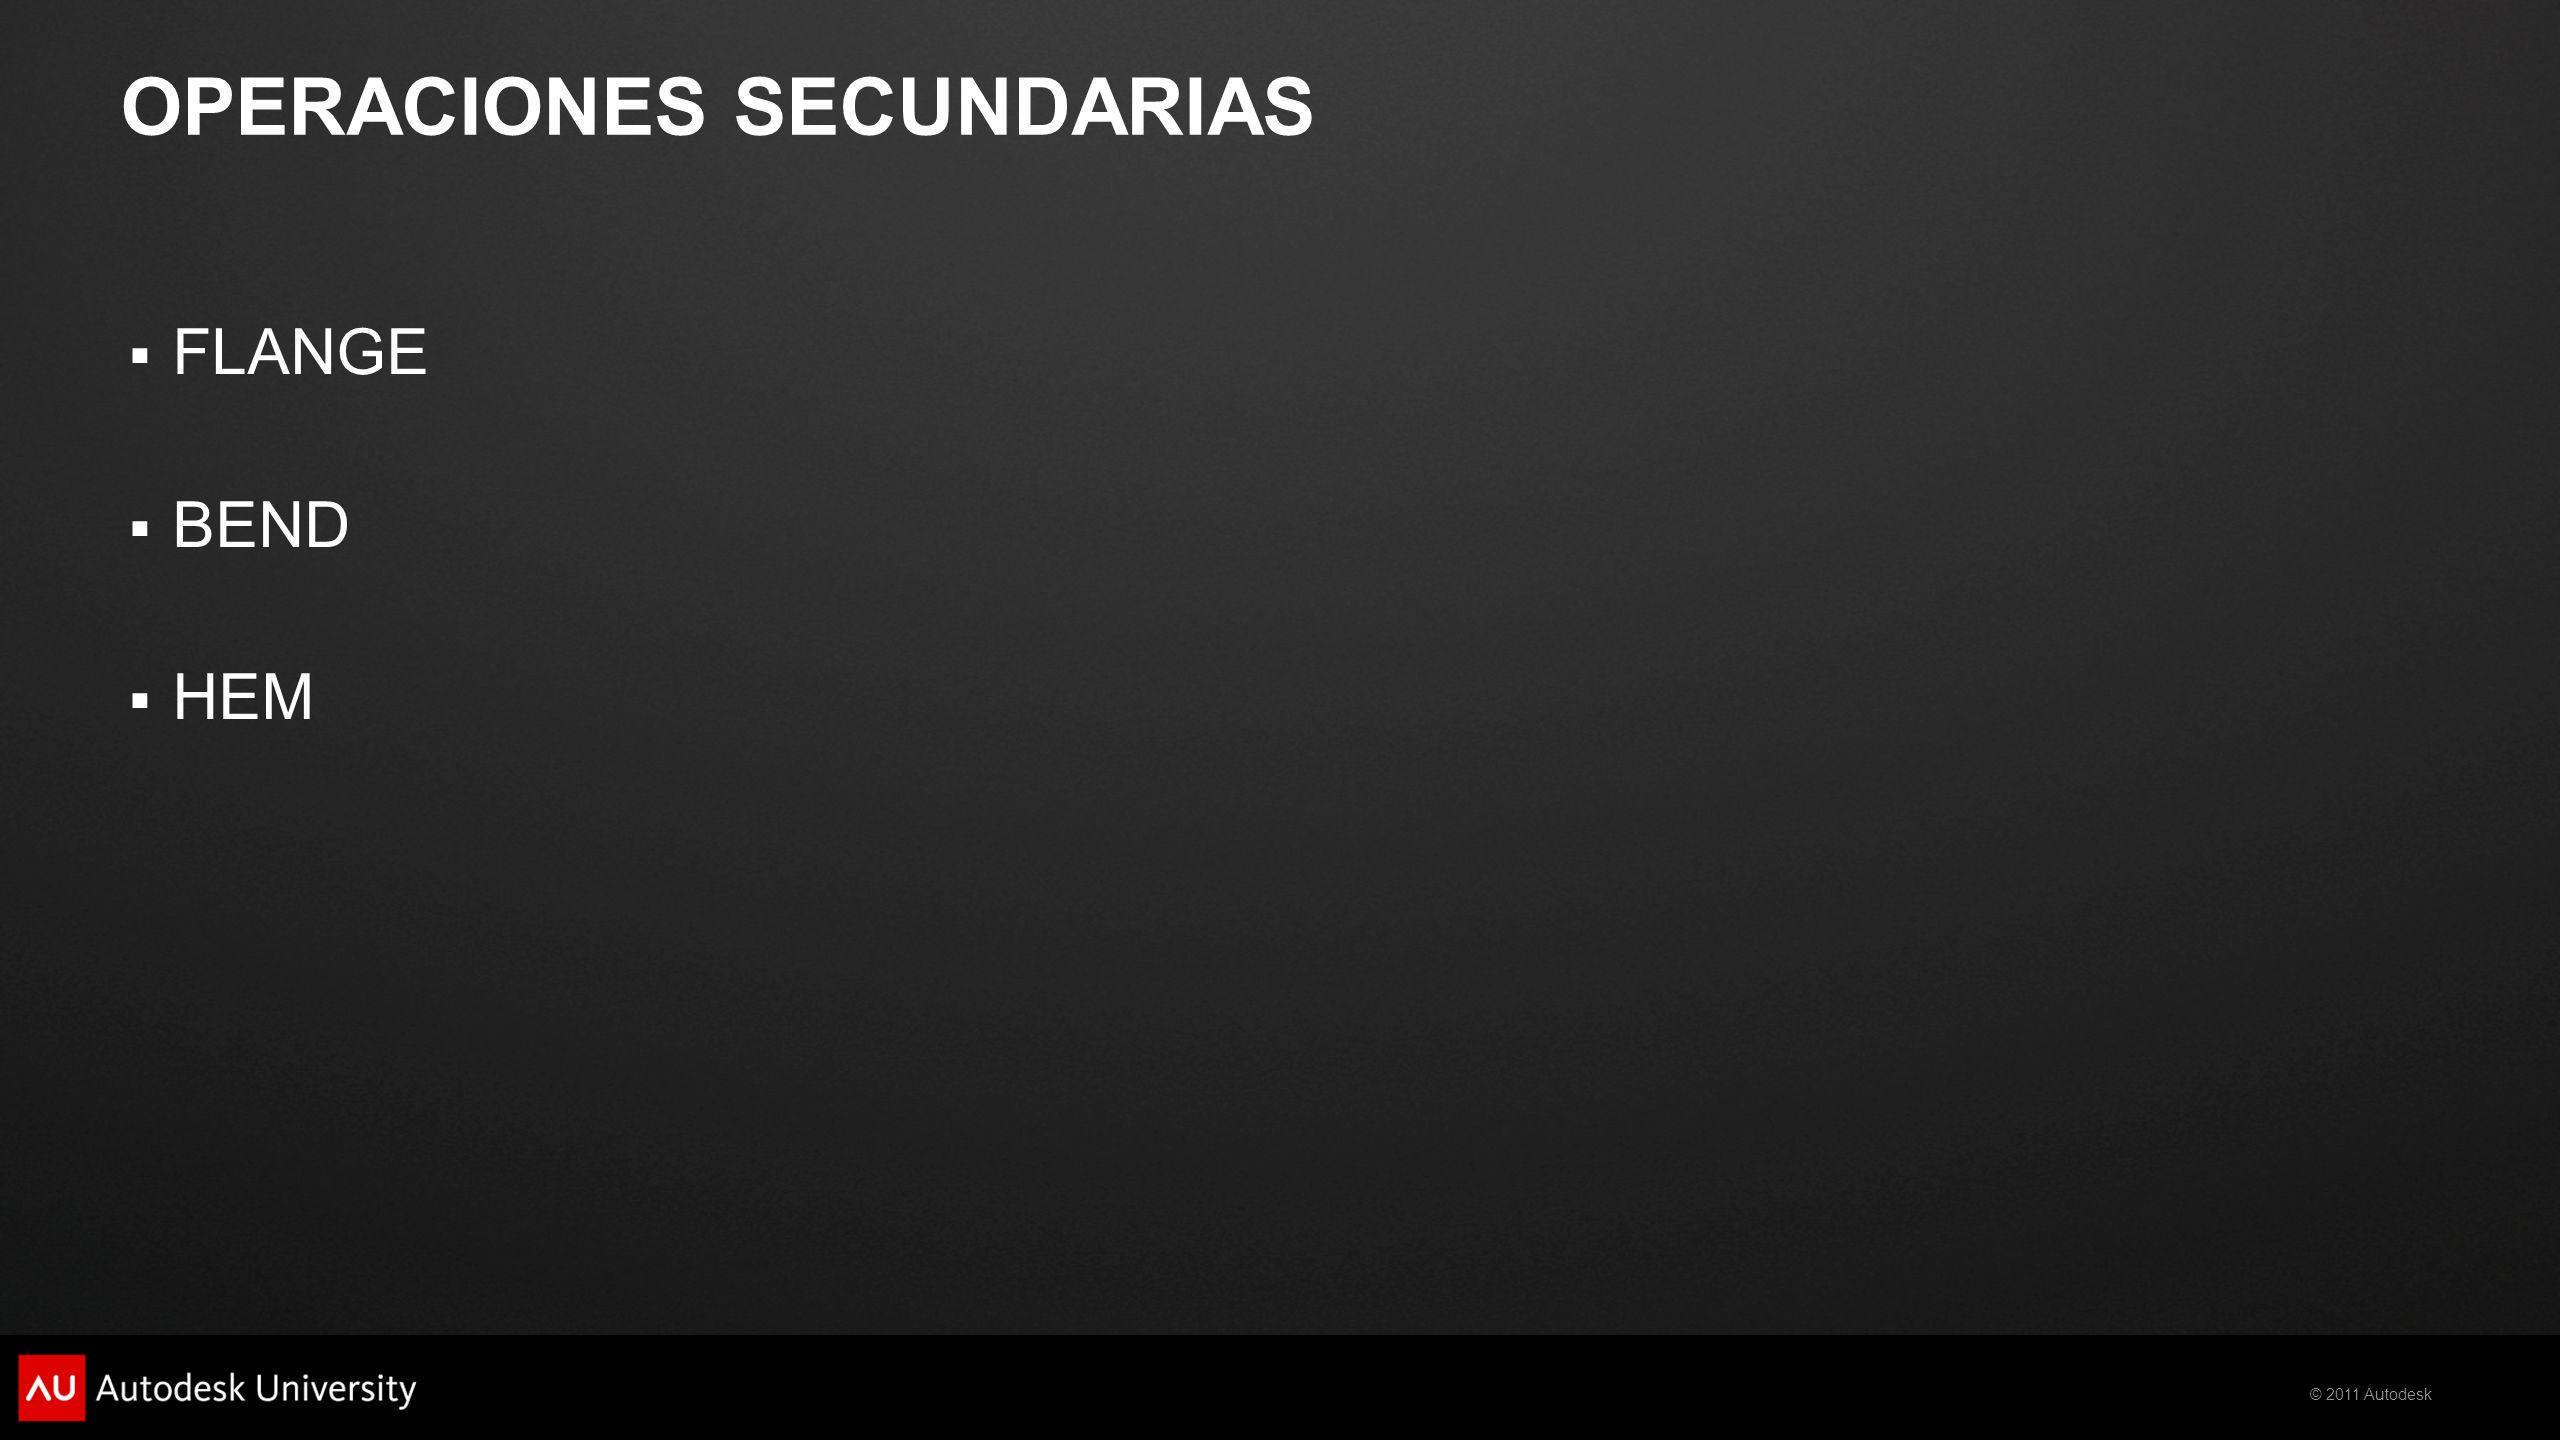 © 2011 Autodesk OPERACIONES SECUNDARIAS FLANGE BEND HEM